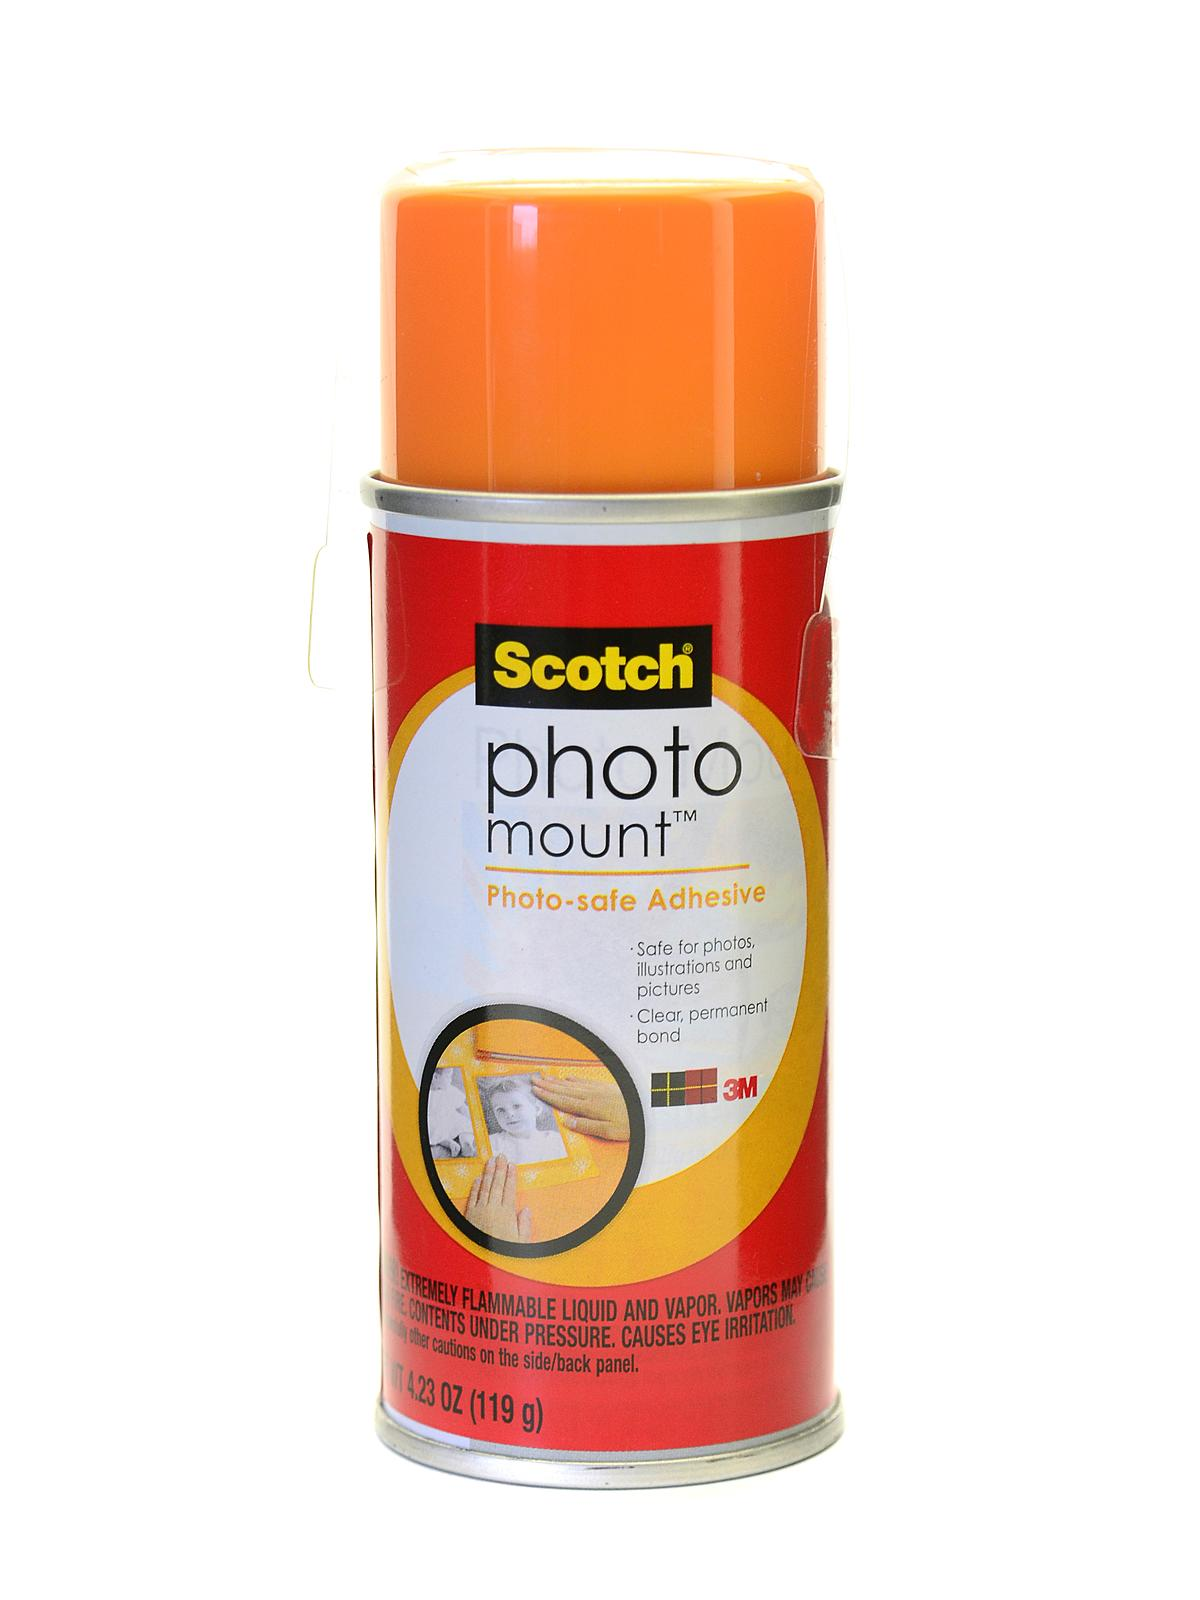 Scotch Photomount Spray Adhesive